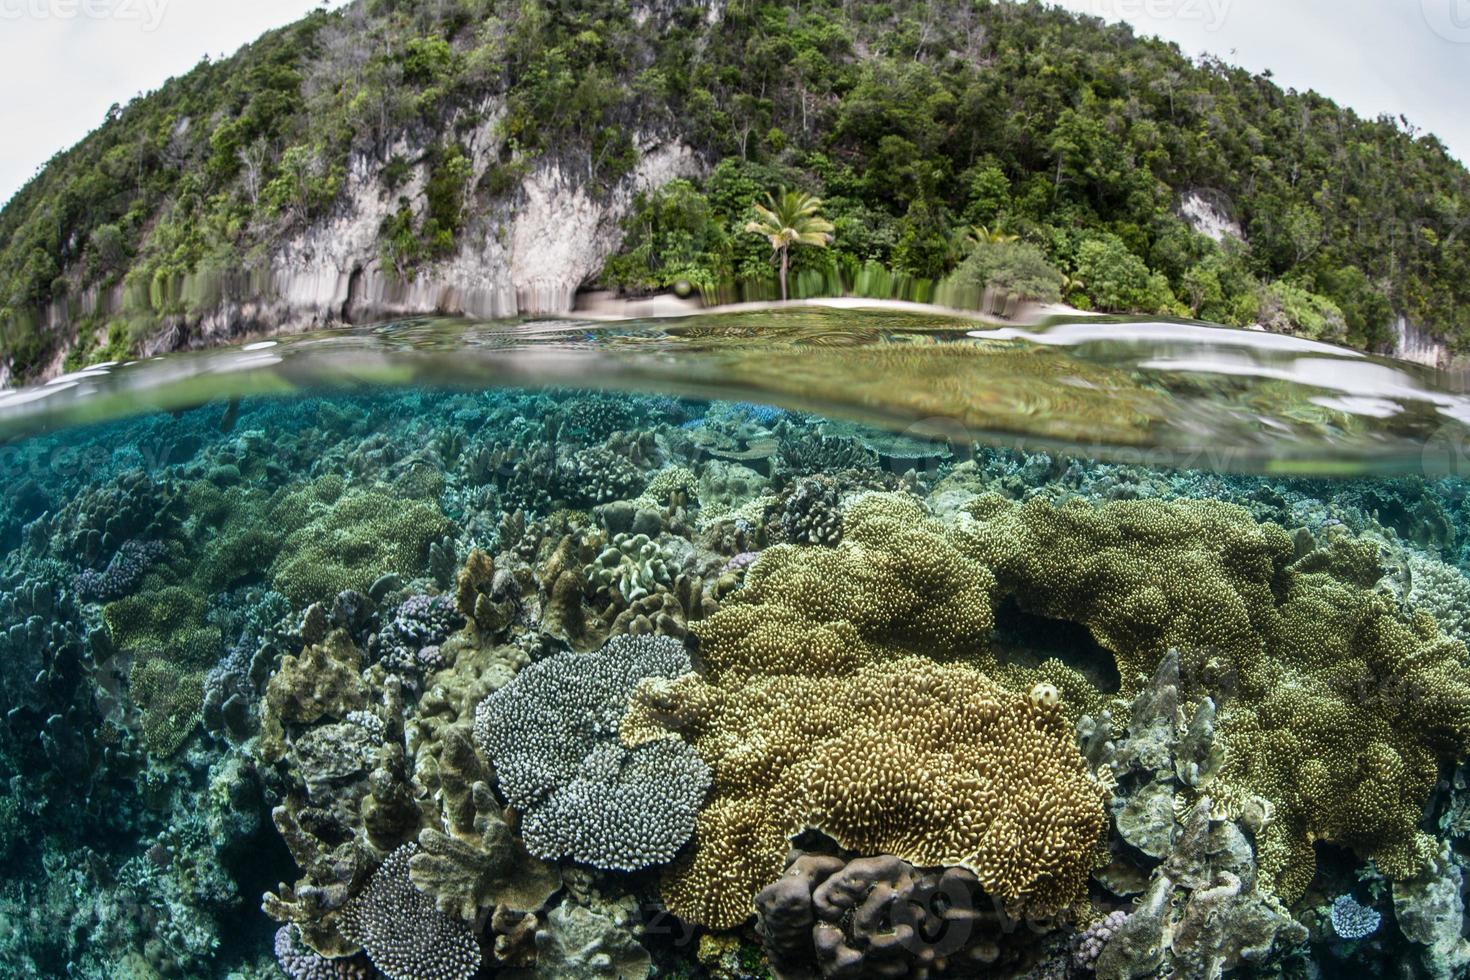 recife de coral perto da ilha de pedra calcária foto